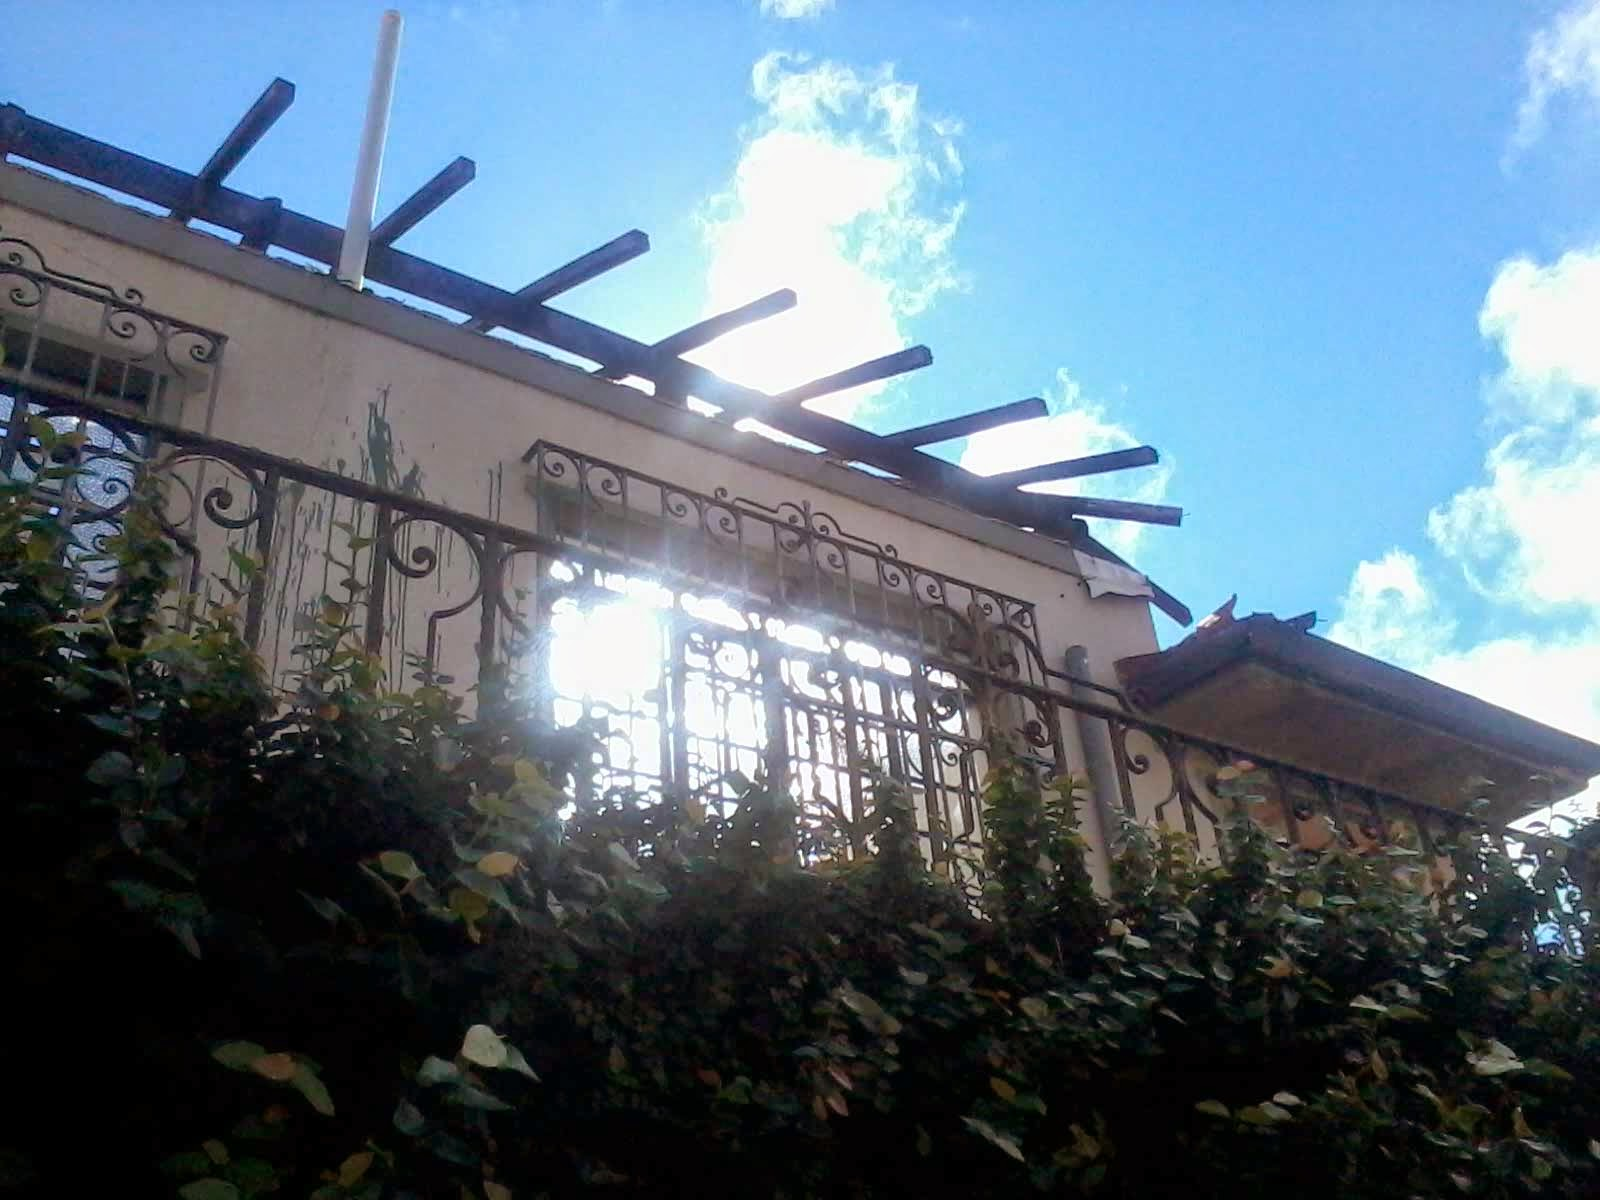 Vila Santa Isabel, Zona Leste de São Paulo, bairros de São Paulo, história de São Paulo, Vila Formosa, Vila Matilde, Vila Carrão